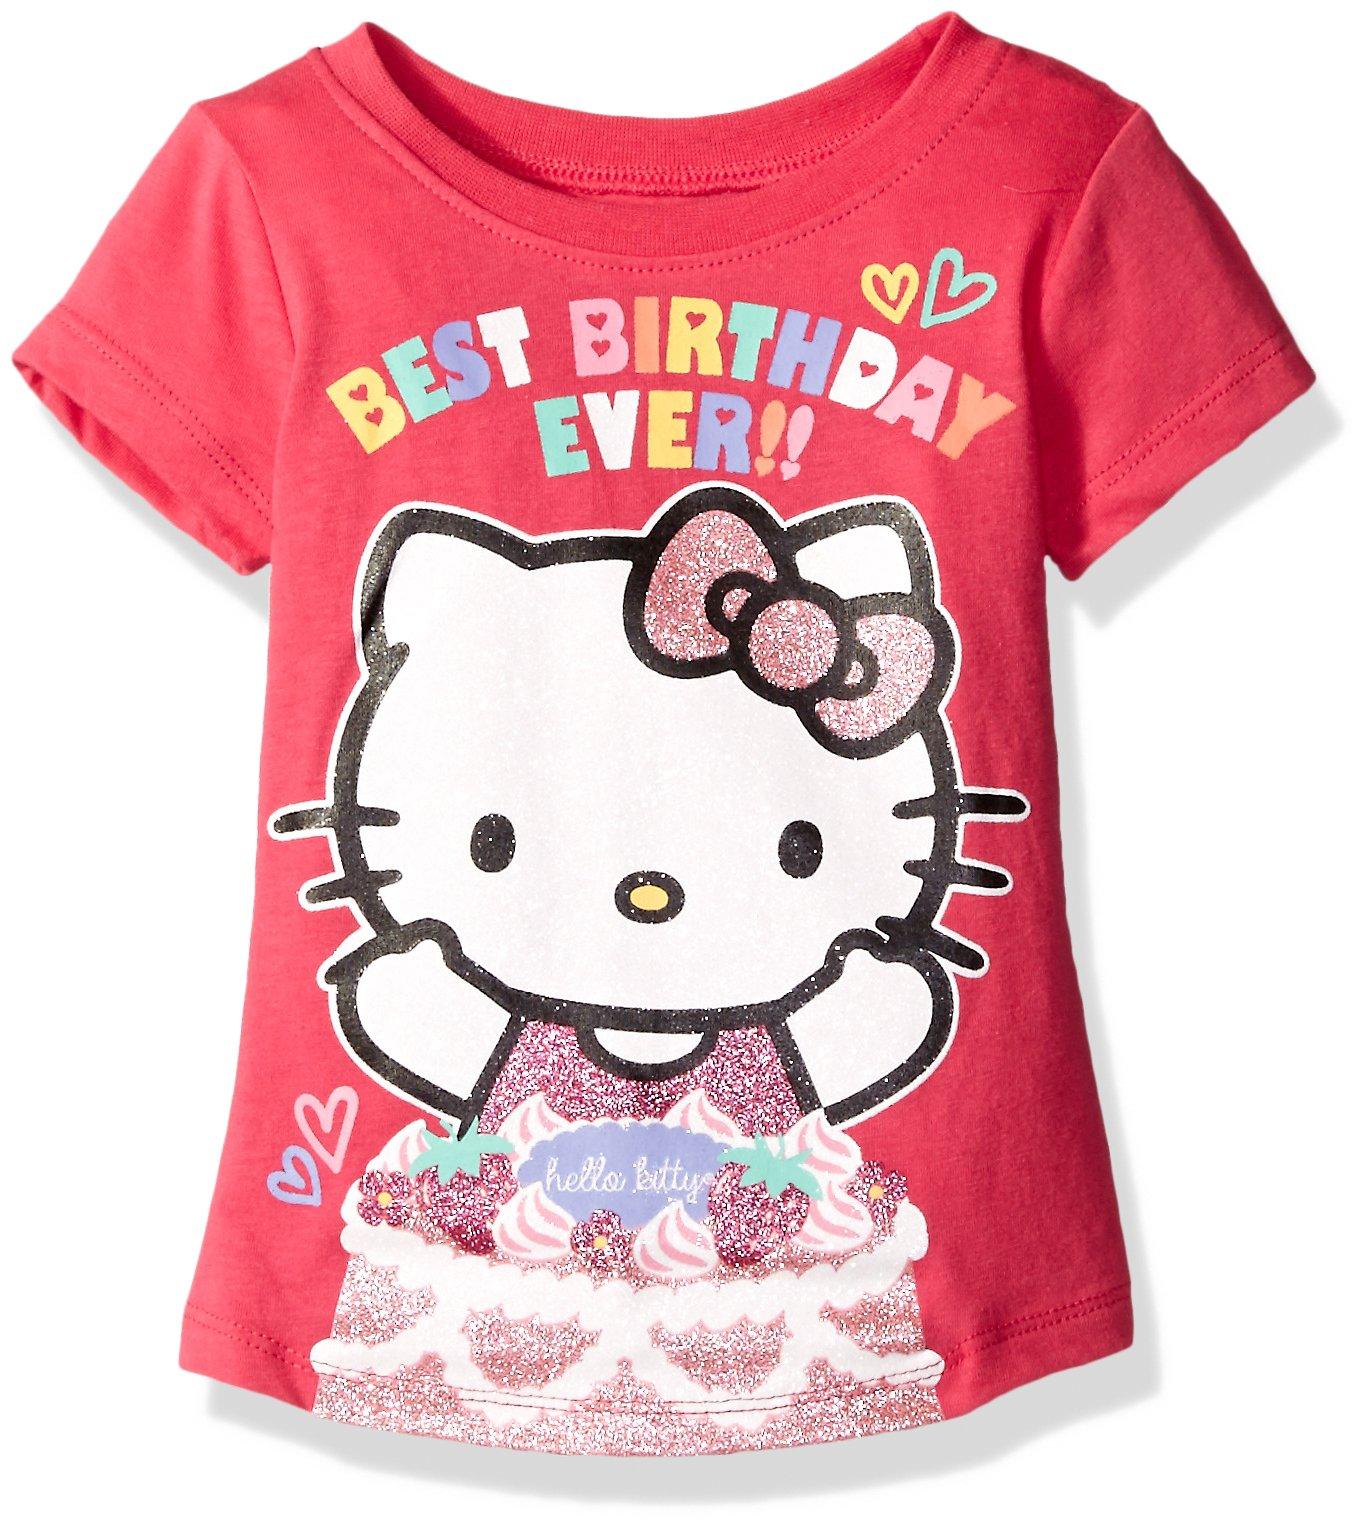 d5295aaf6 Galleon - Hello Kitty Girls' Little Girls' Happy Birthday T-Shirt, Fuchsia  Pink, 5